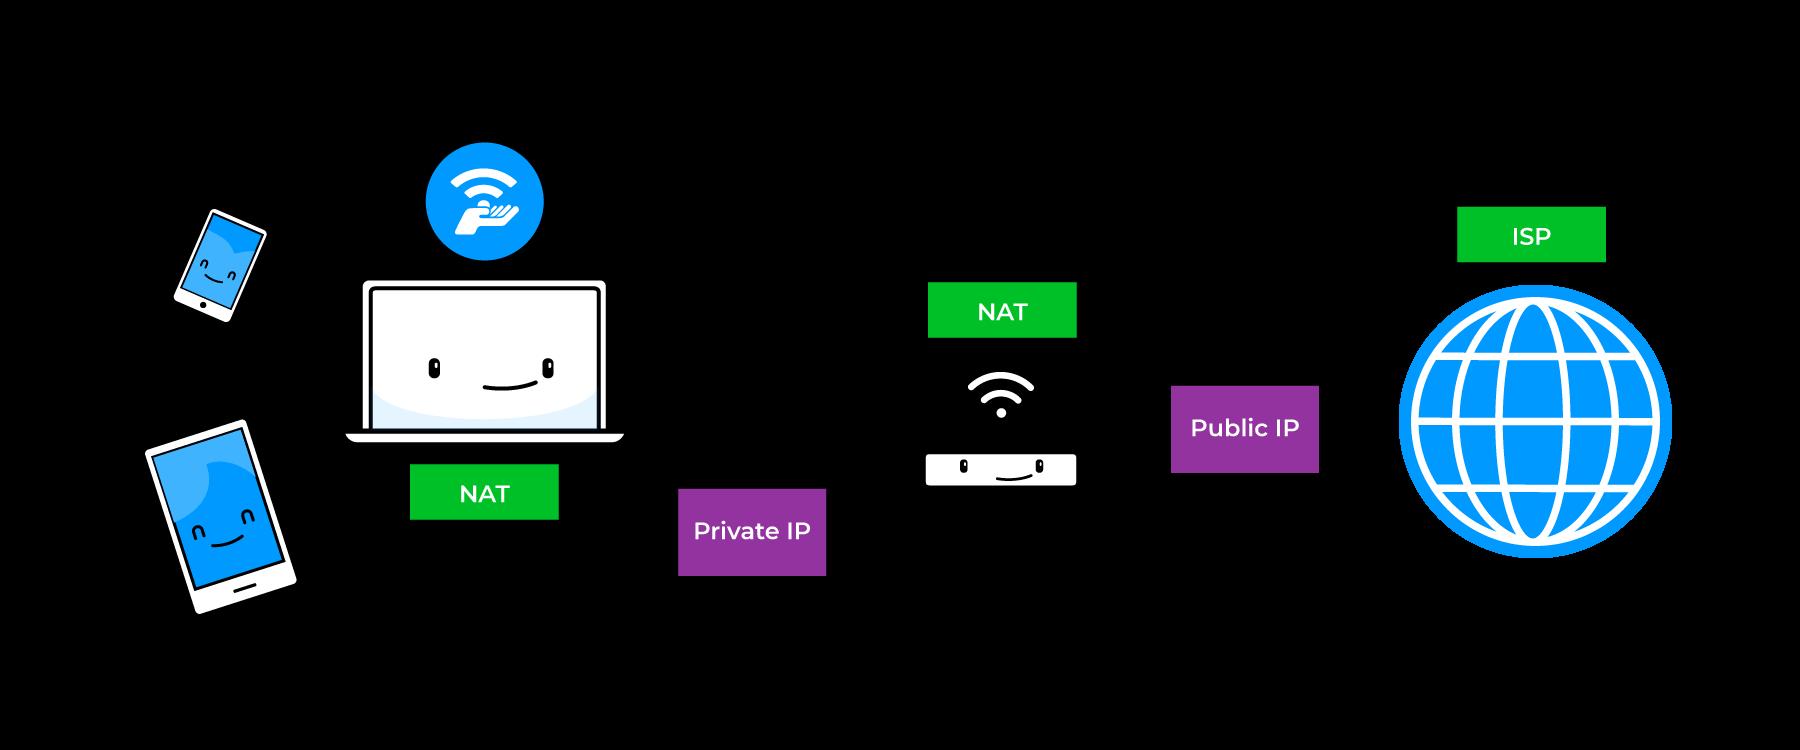 How do I change my NAT type? - Connectify Hotspot Knowledge Base